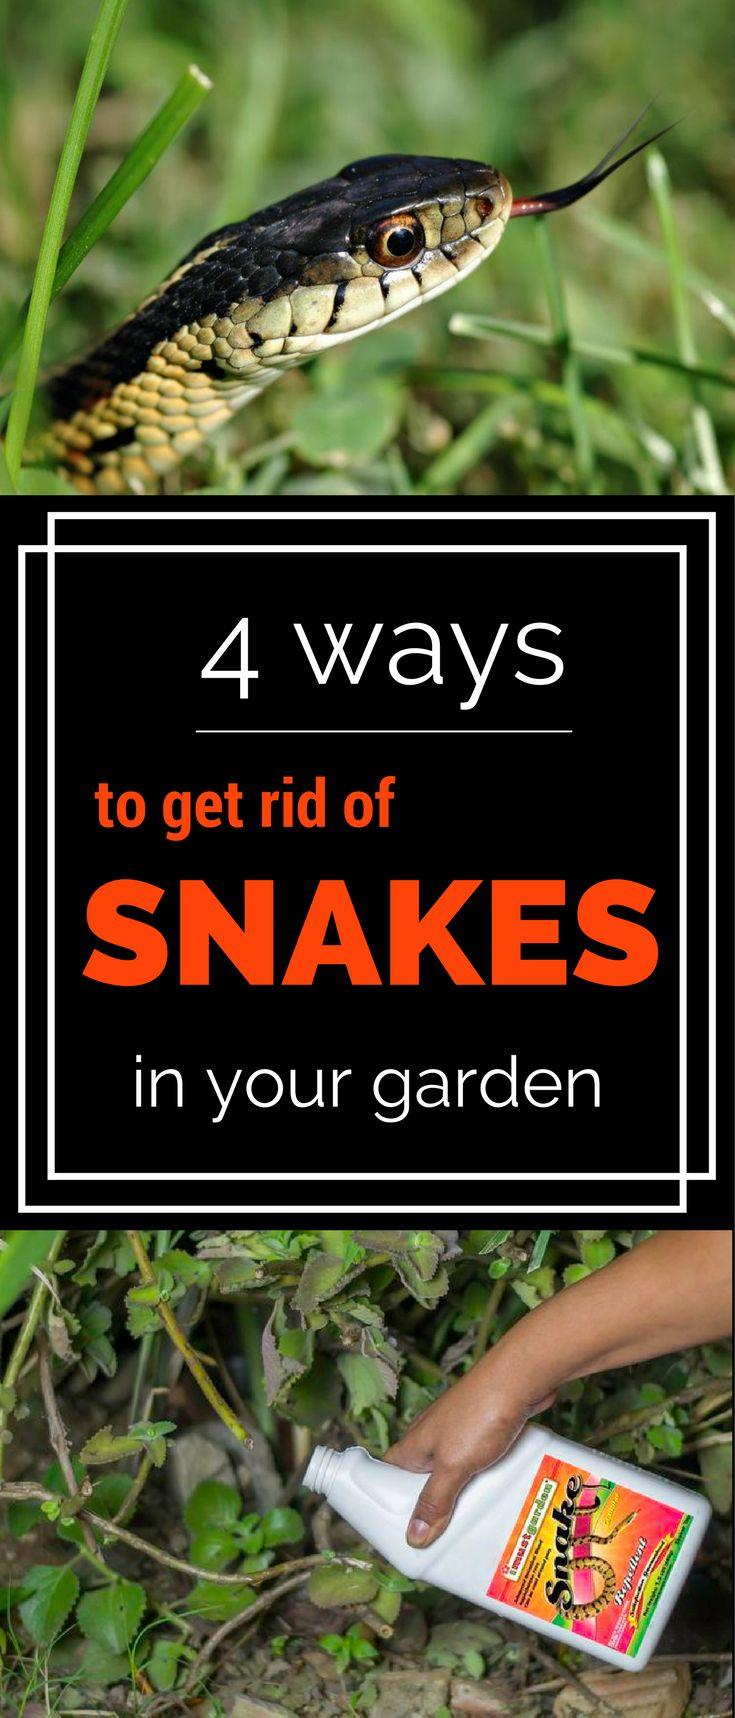 2172 Best Images About Garden Ideas Ii On Pinterest Gardens Raised Beds And Obelisks